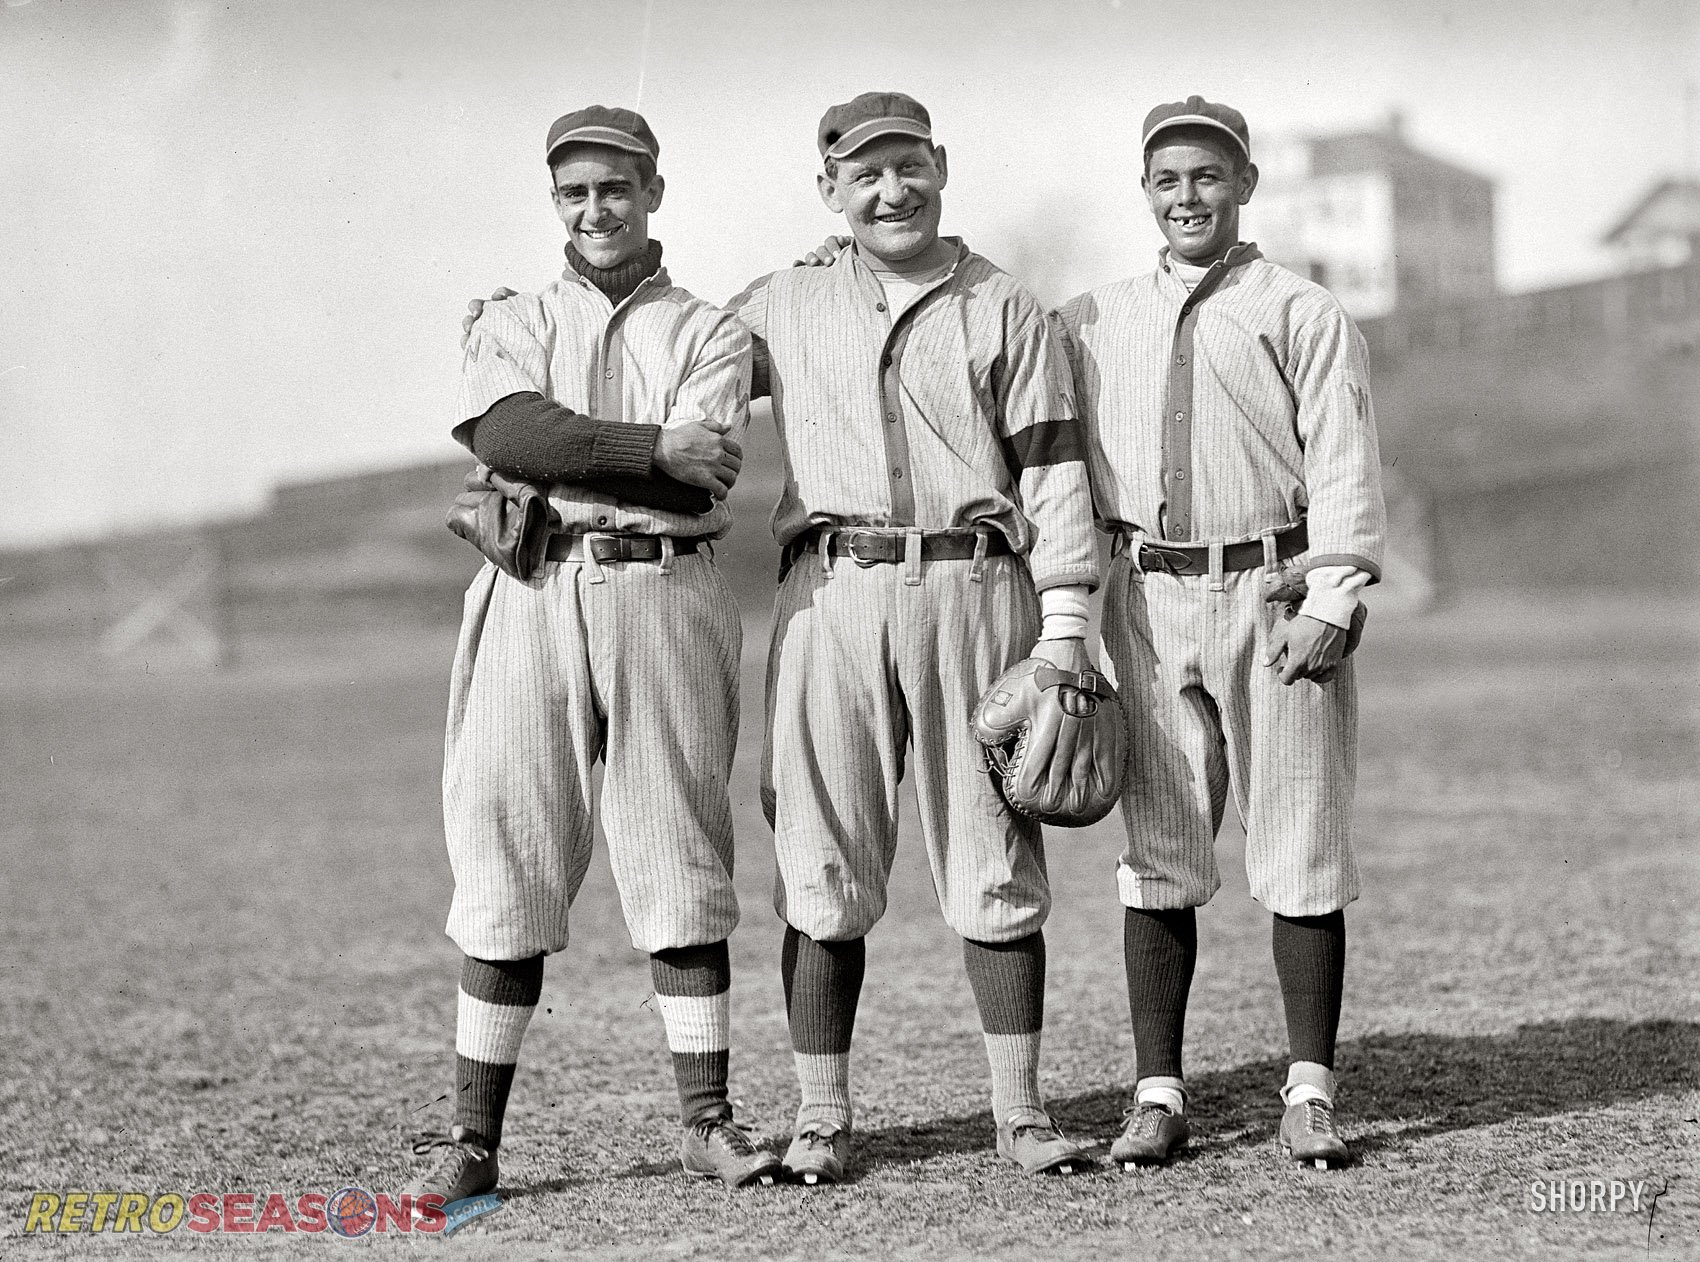 Bench players of the 1913 Senators